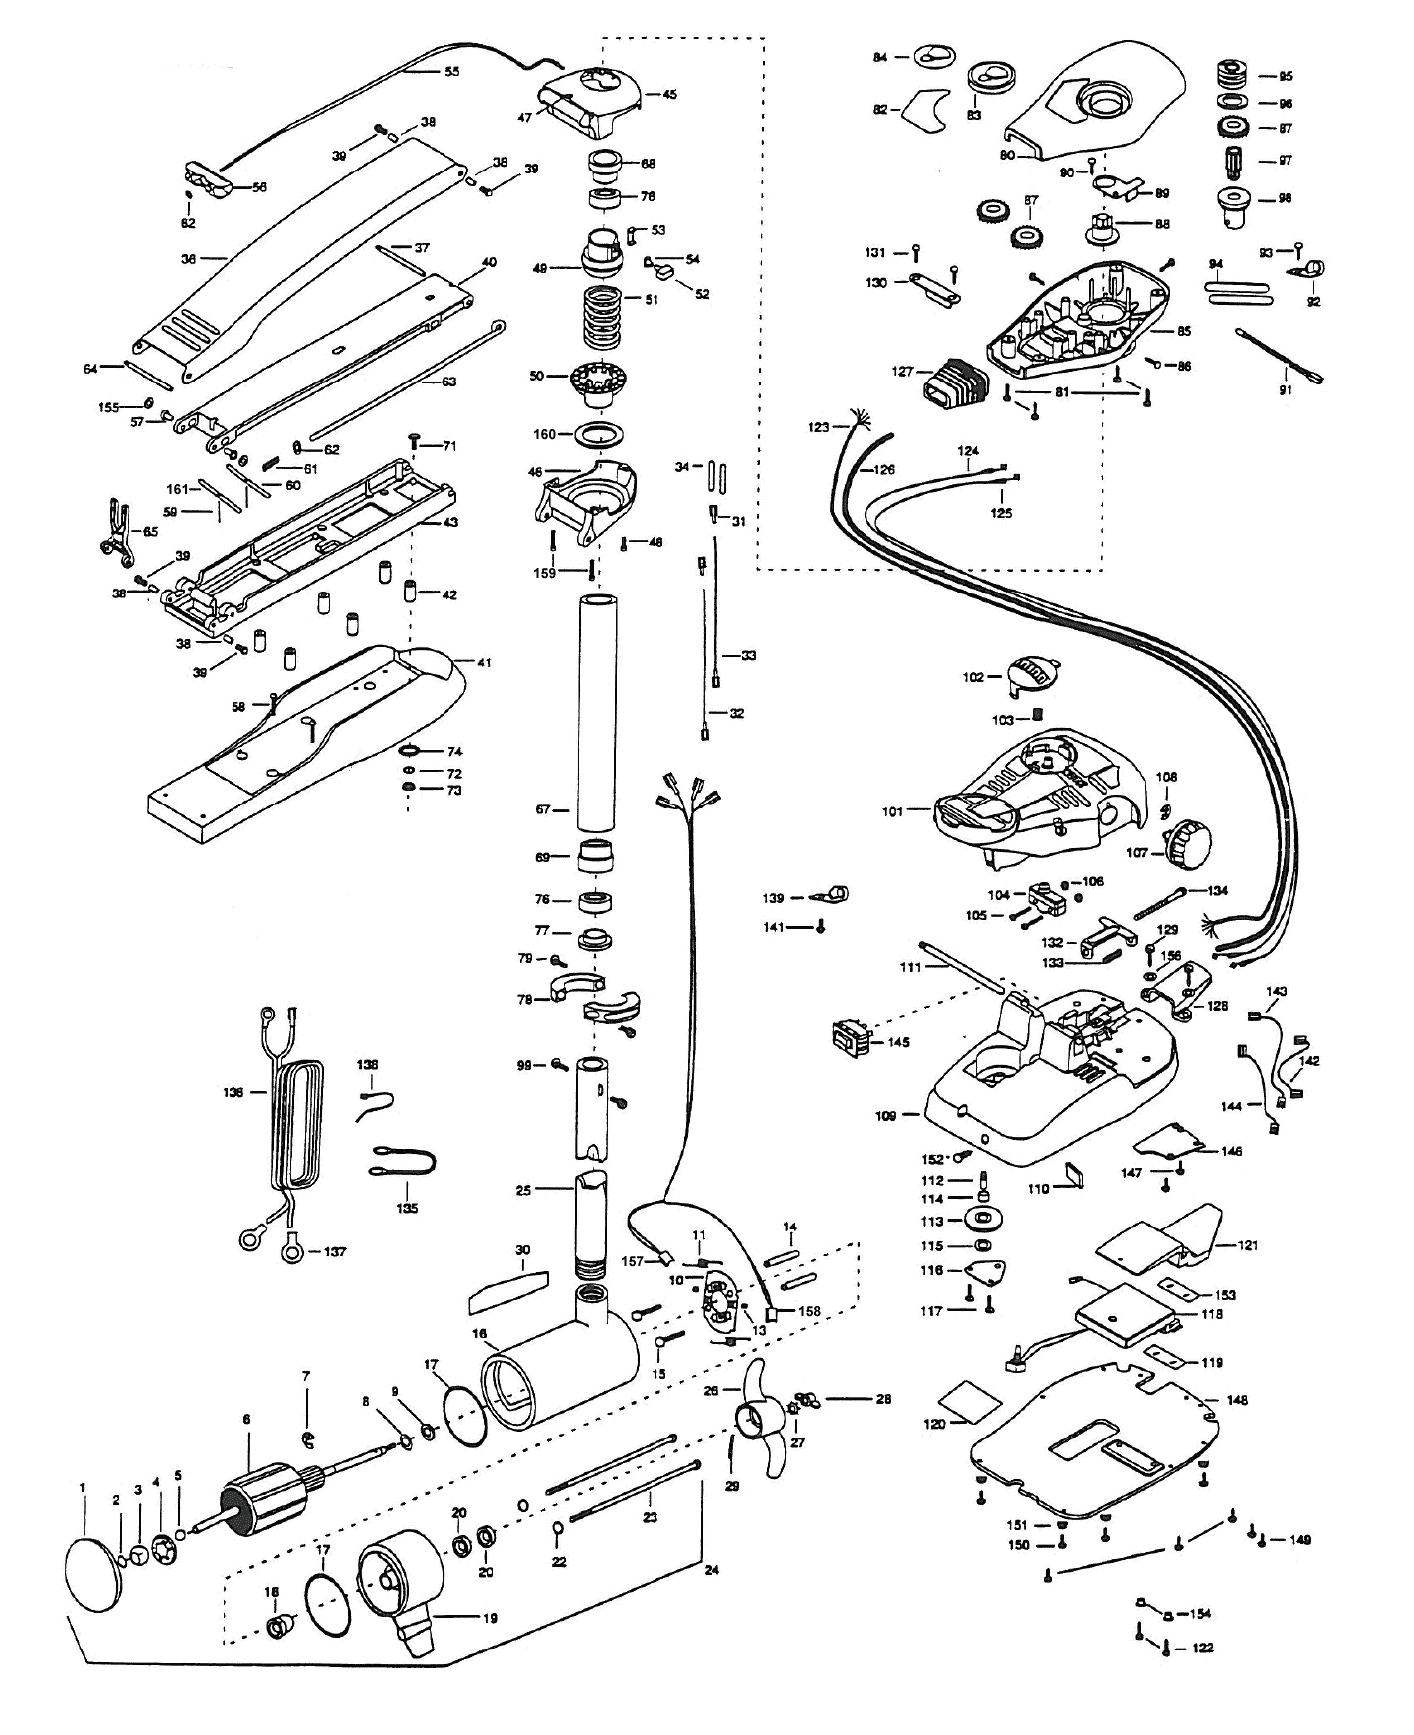 Minn Kota Rt 74 Wiring Diagram